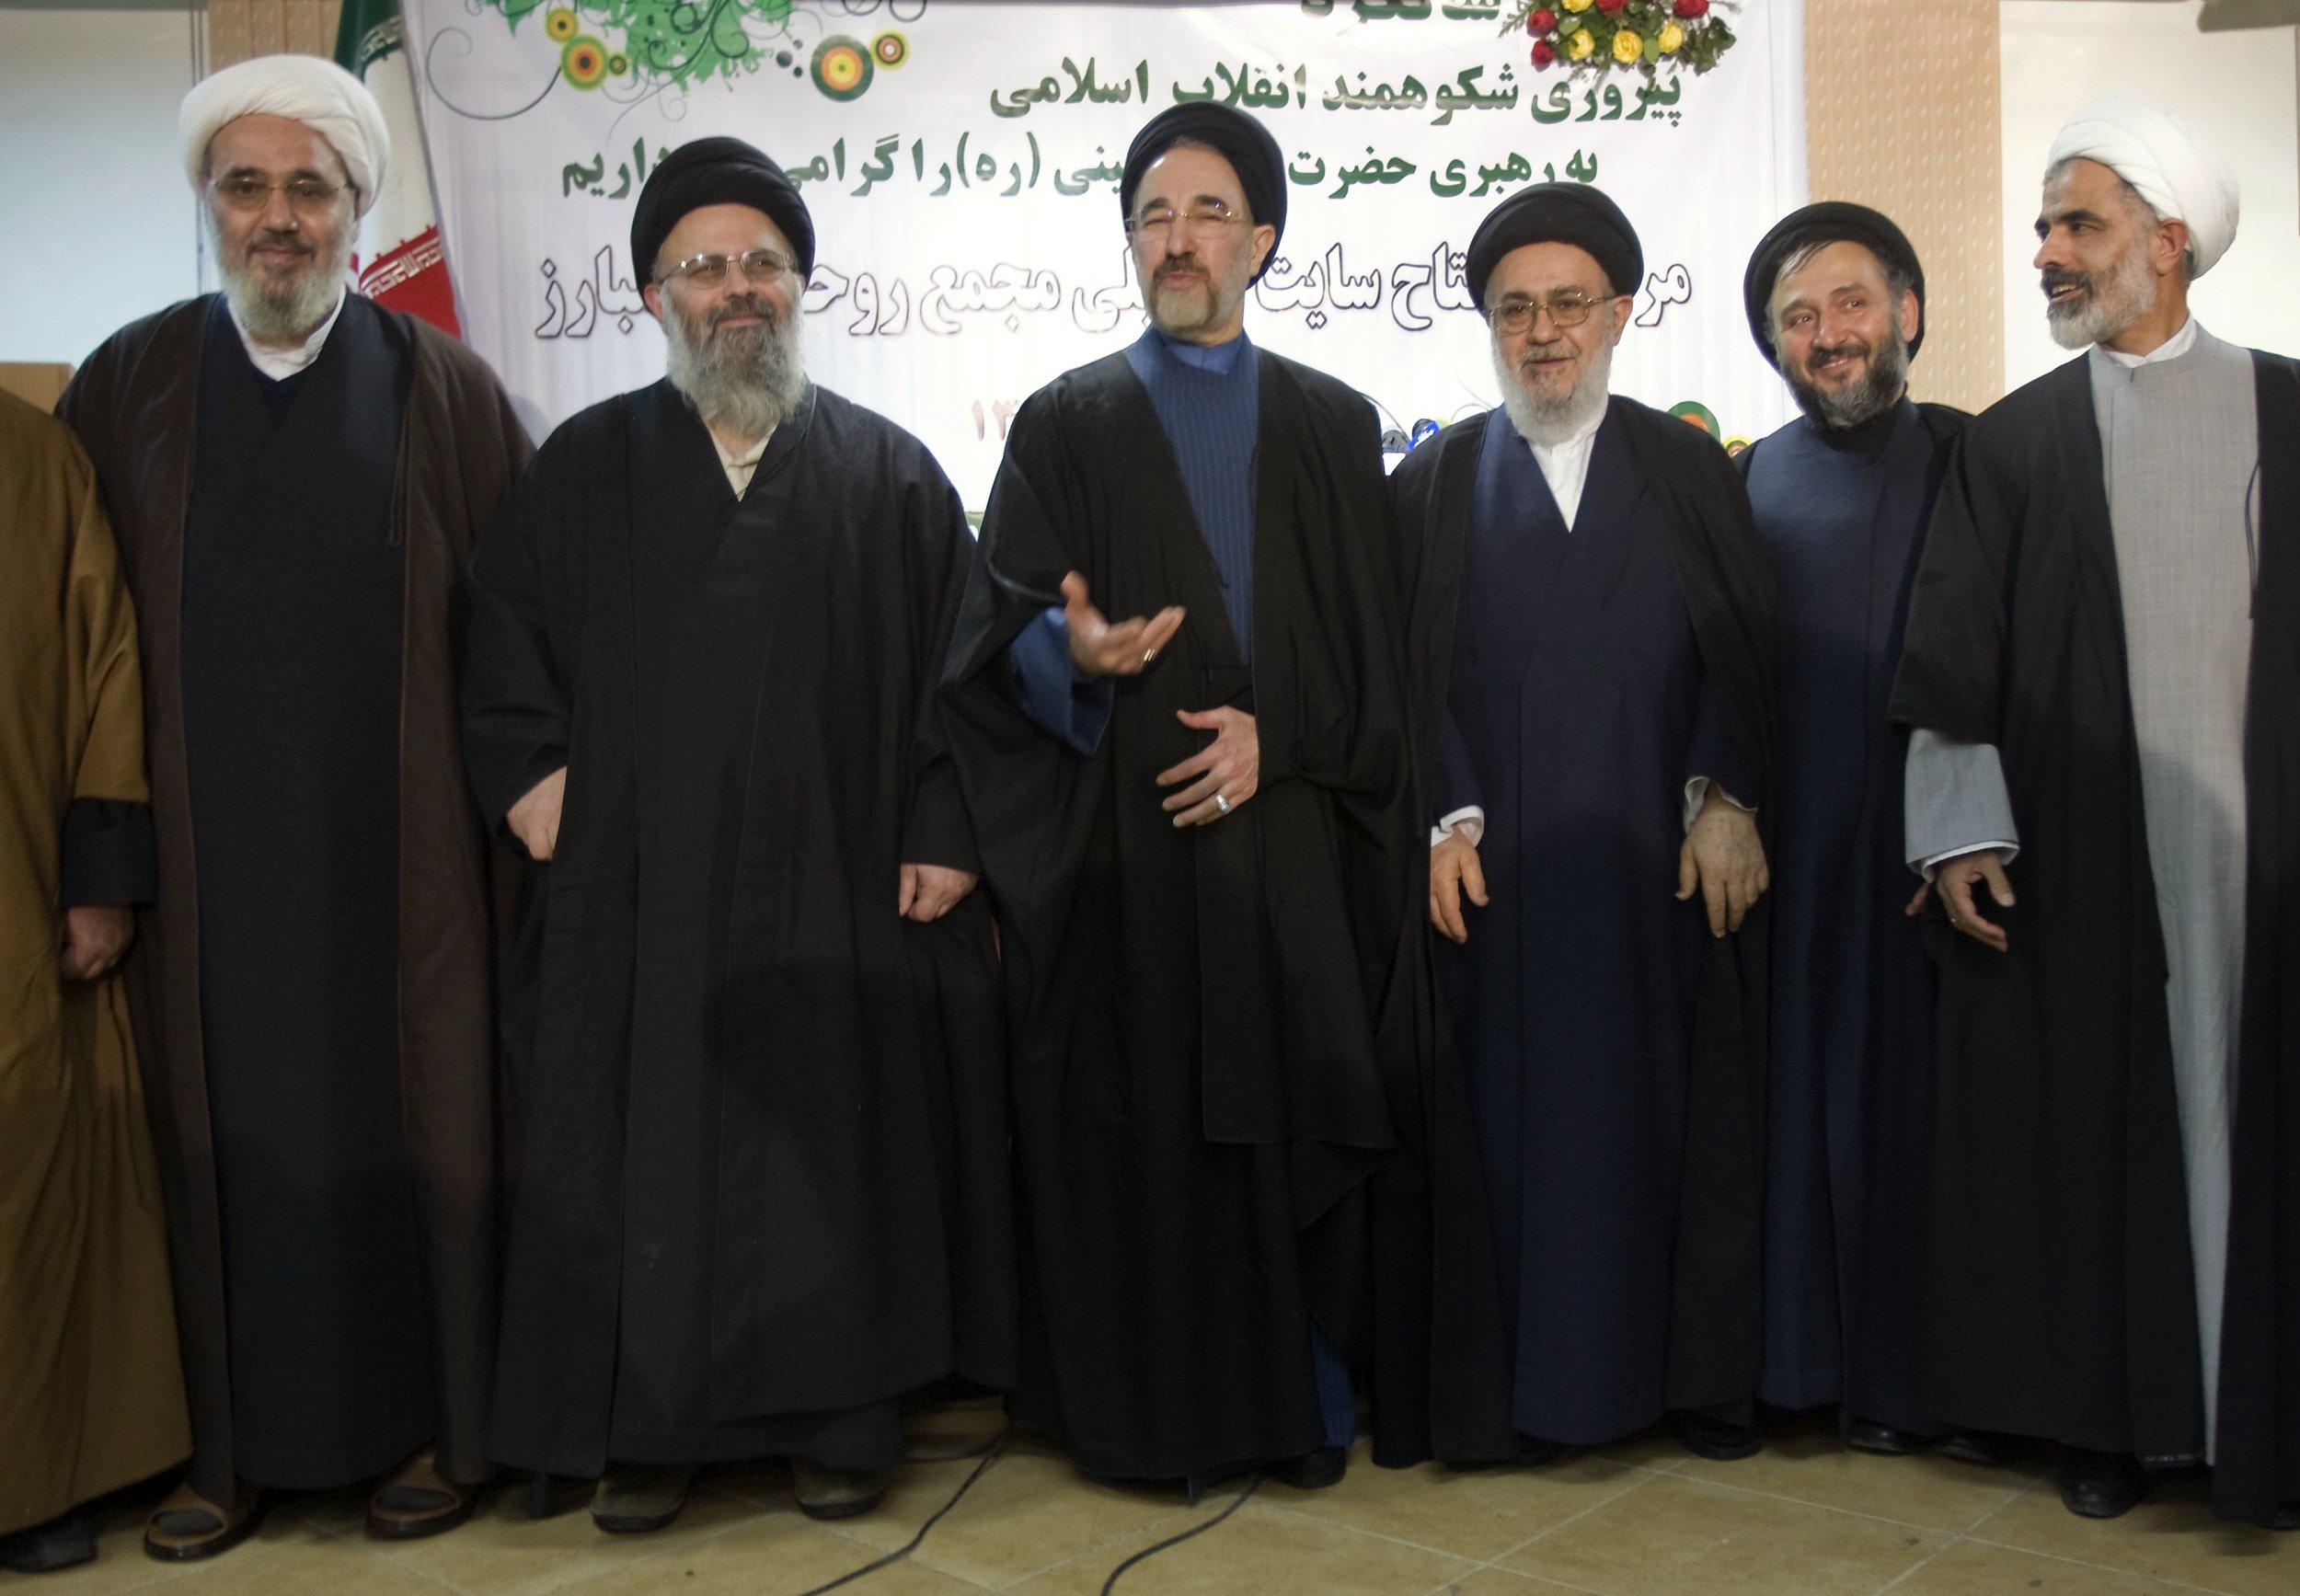 01_25_iranian_moderates_01